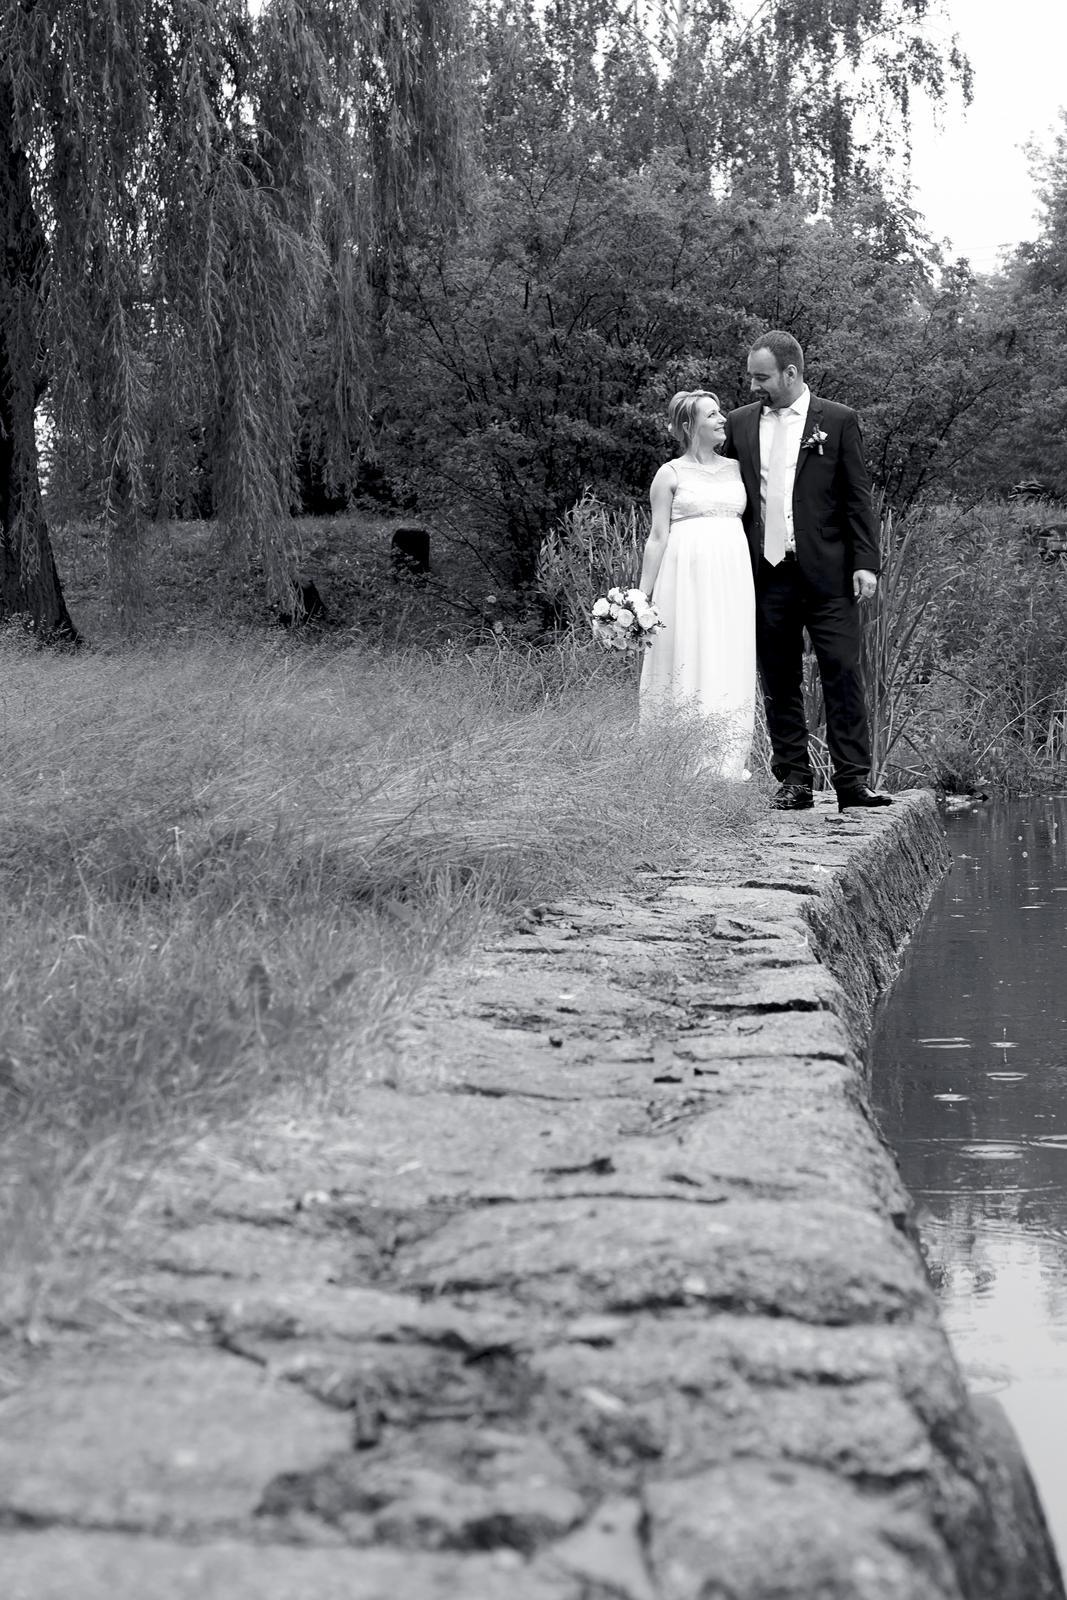 1.6.2018 svatba Jinočany - Obrázek č. 2